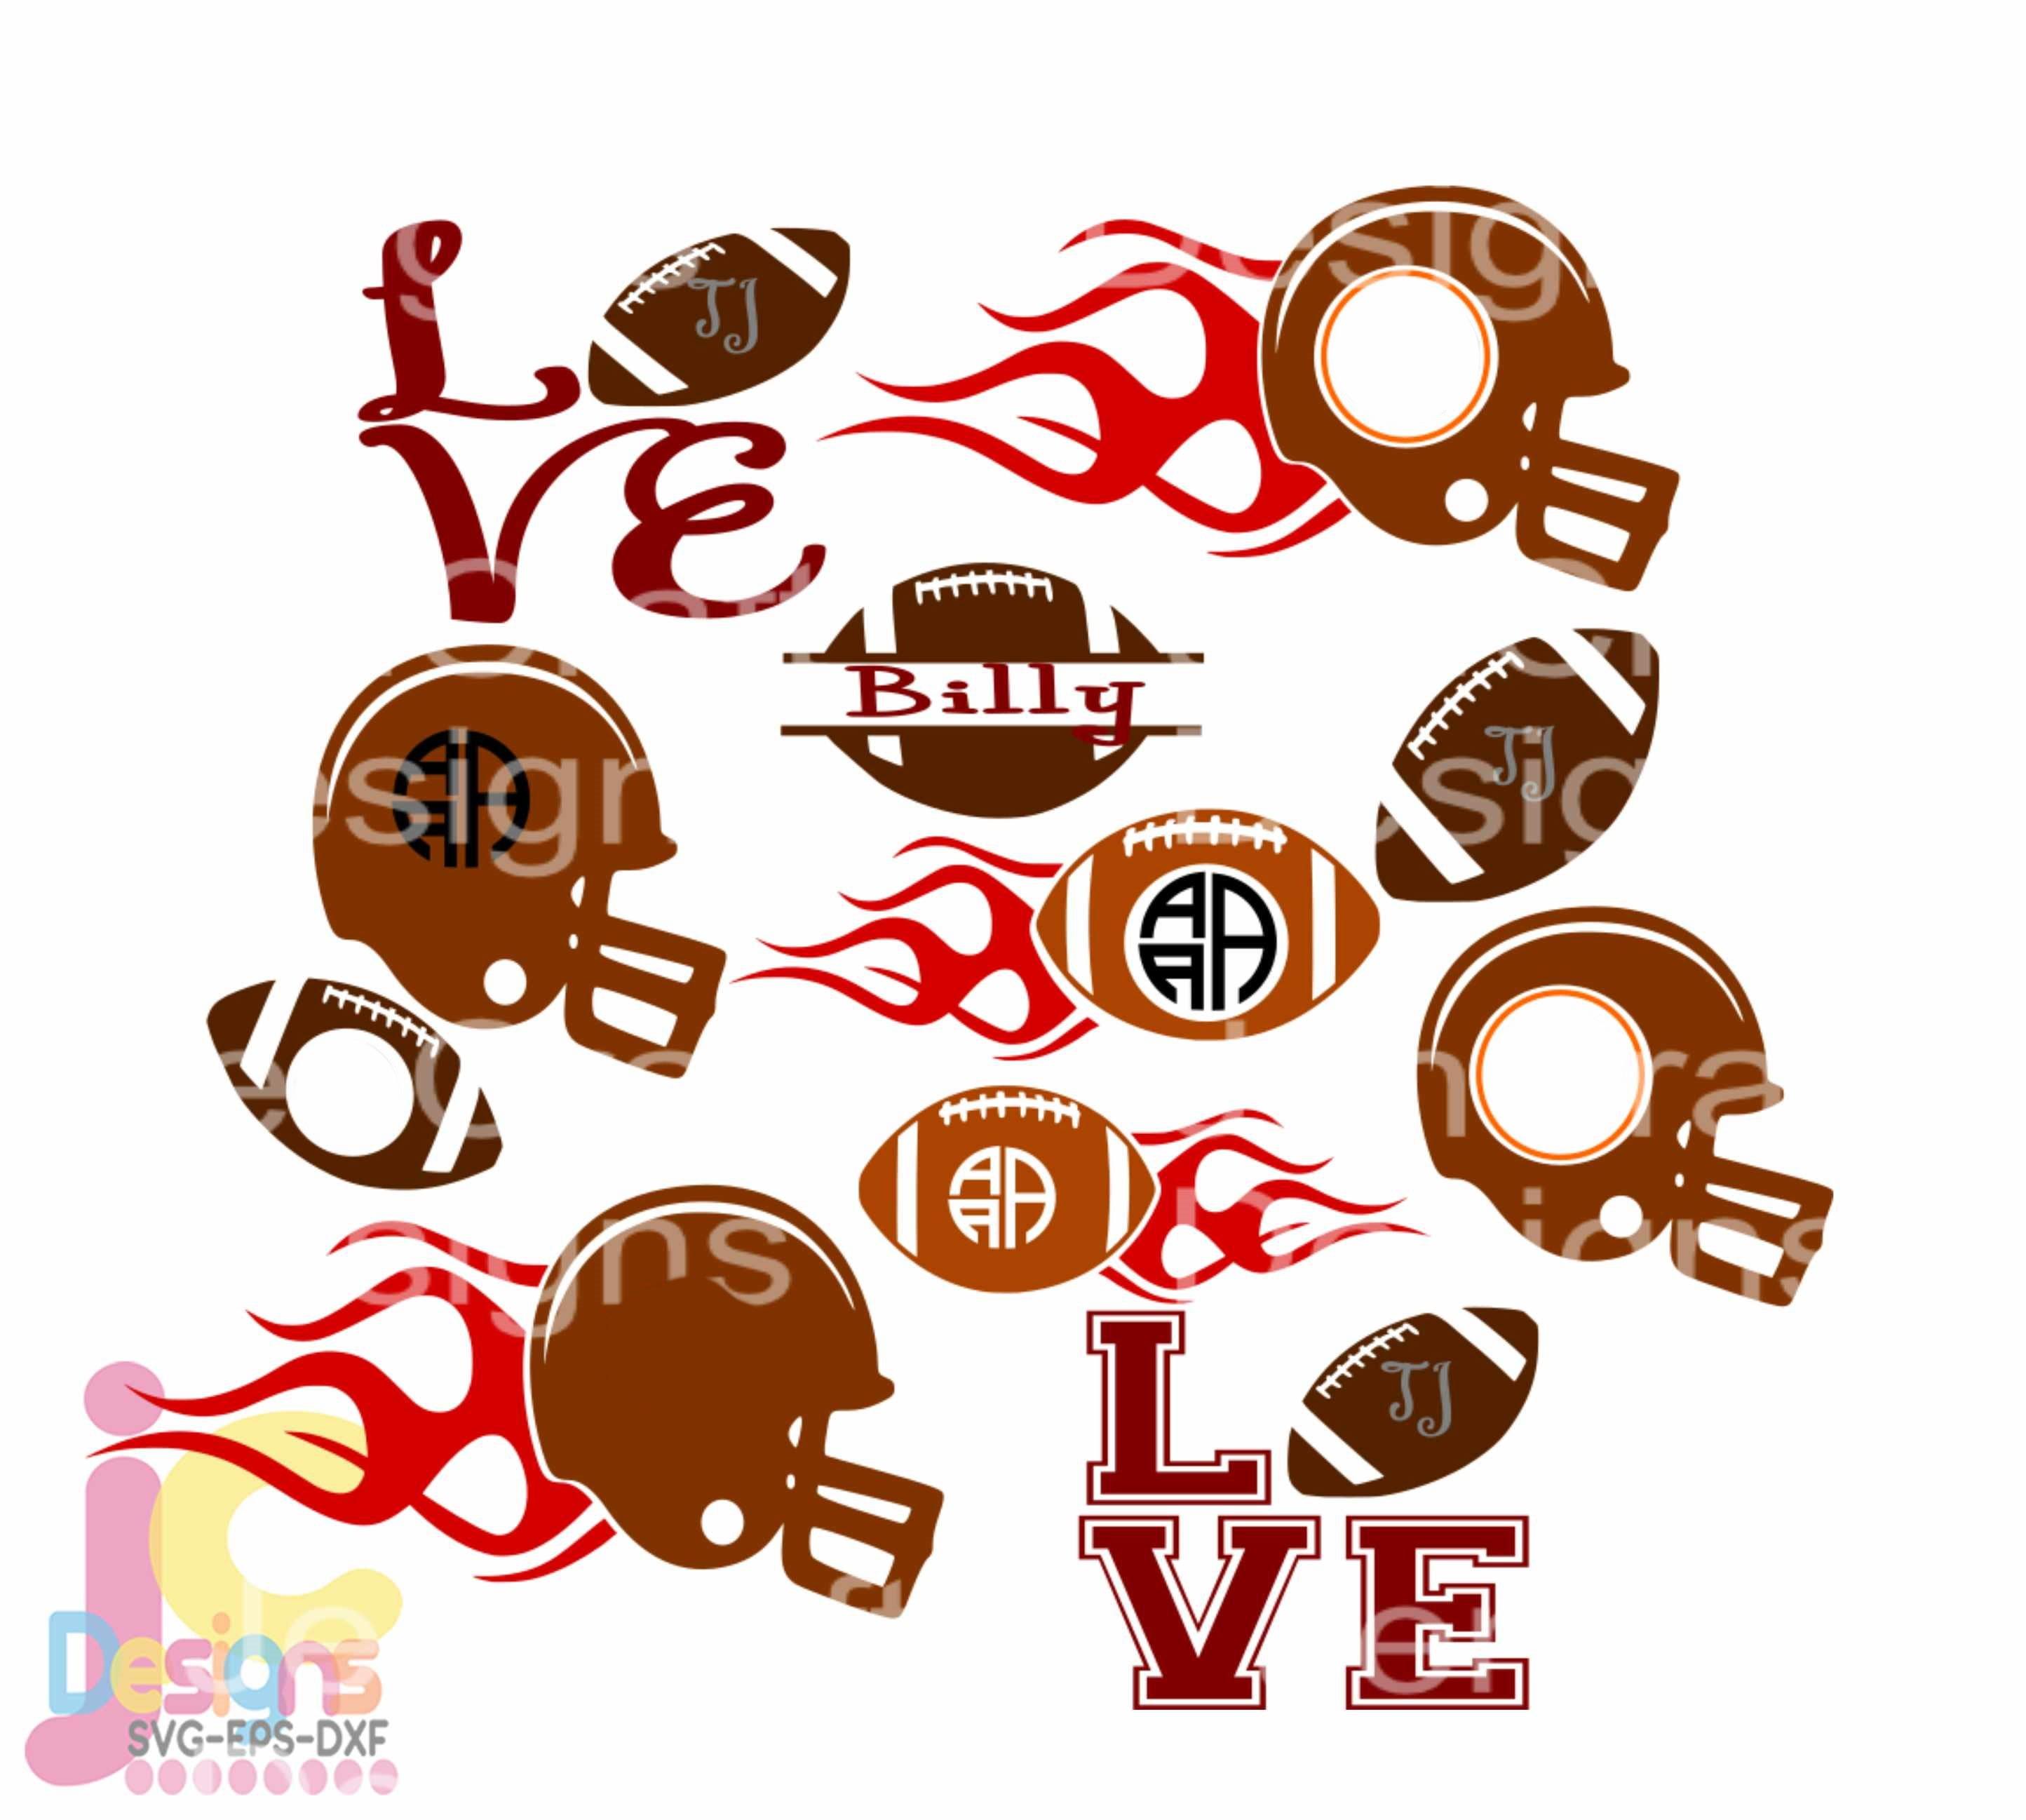 Football Svg Football Mom Monogram Frames Love Helmet Svg Dxf Jpg Png Vector Cut File Svg Cut File Silhouette Cricut Digital Design